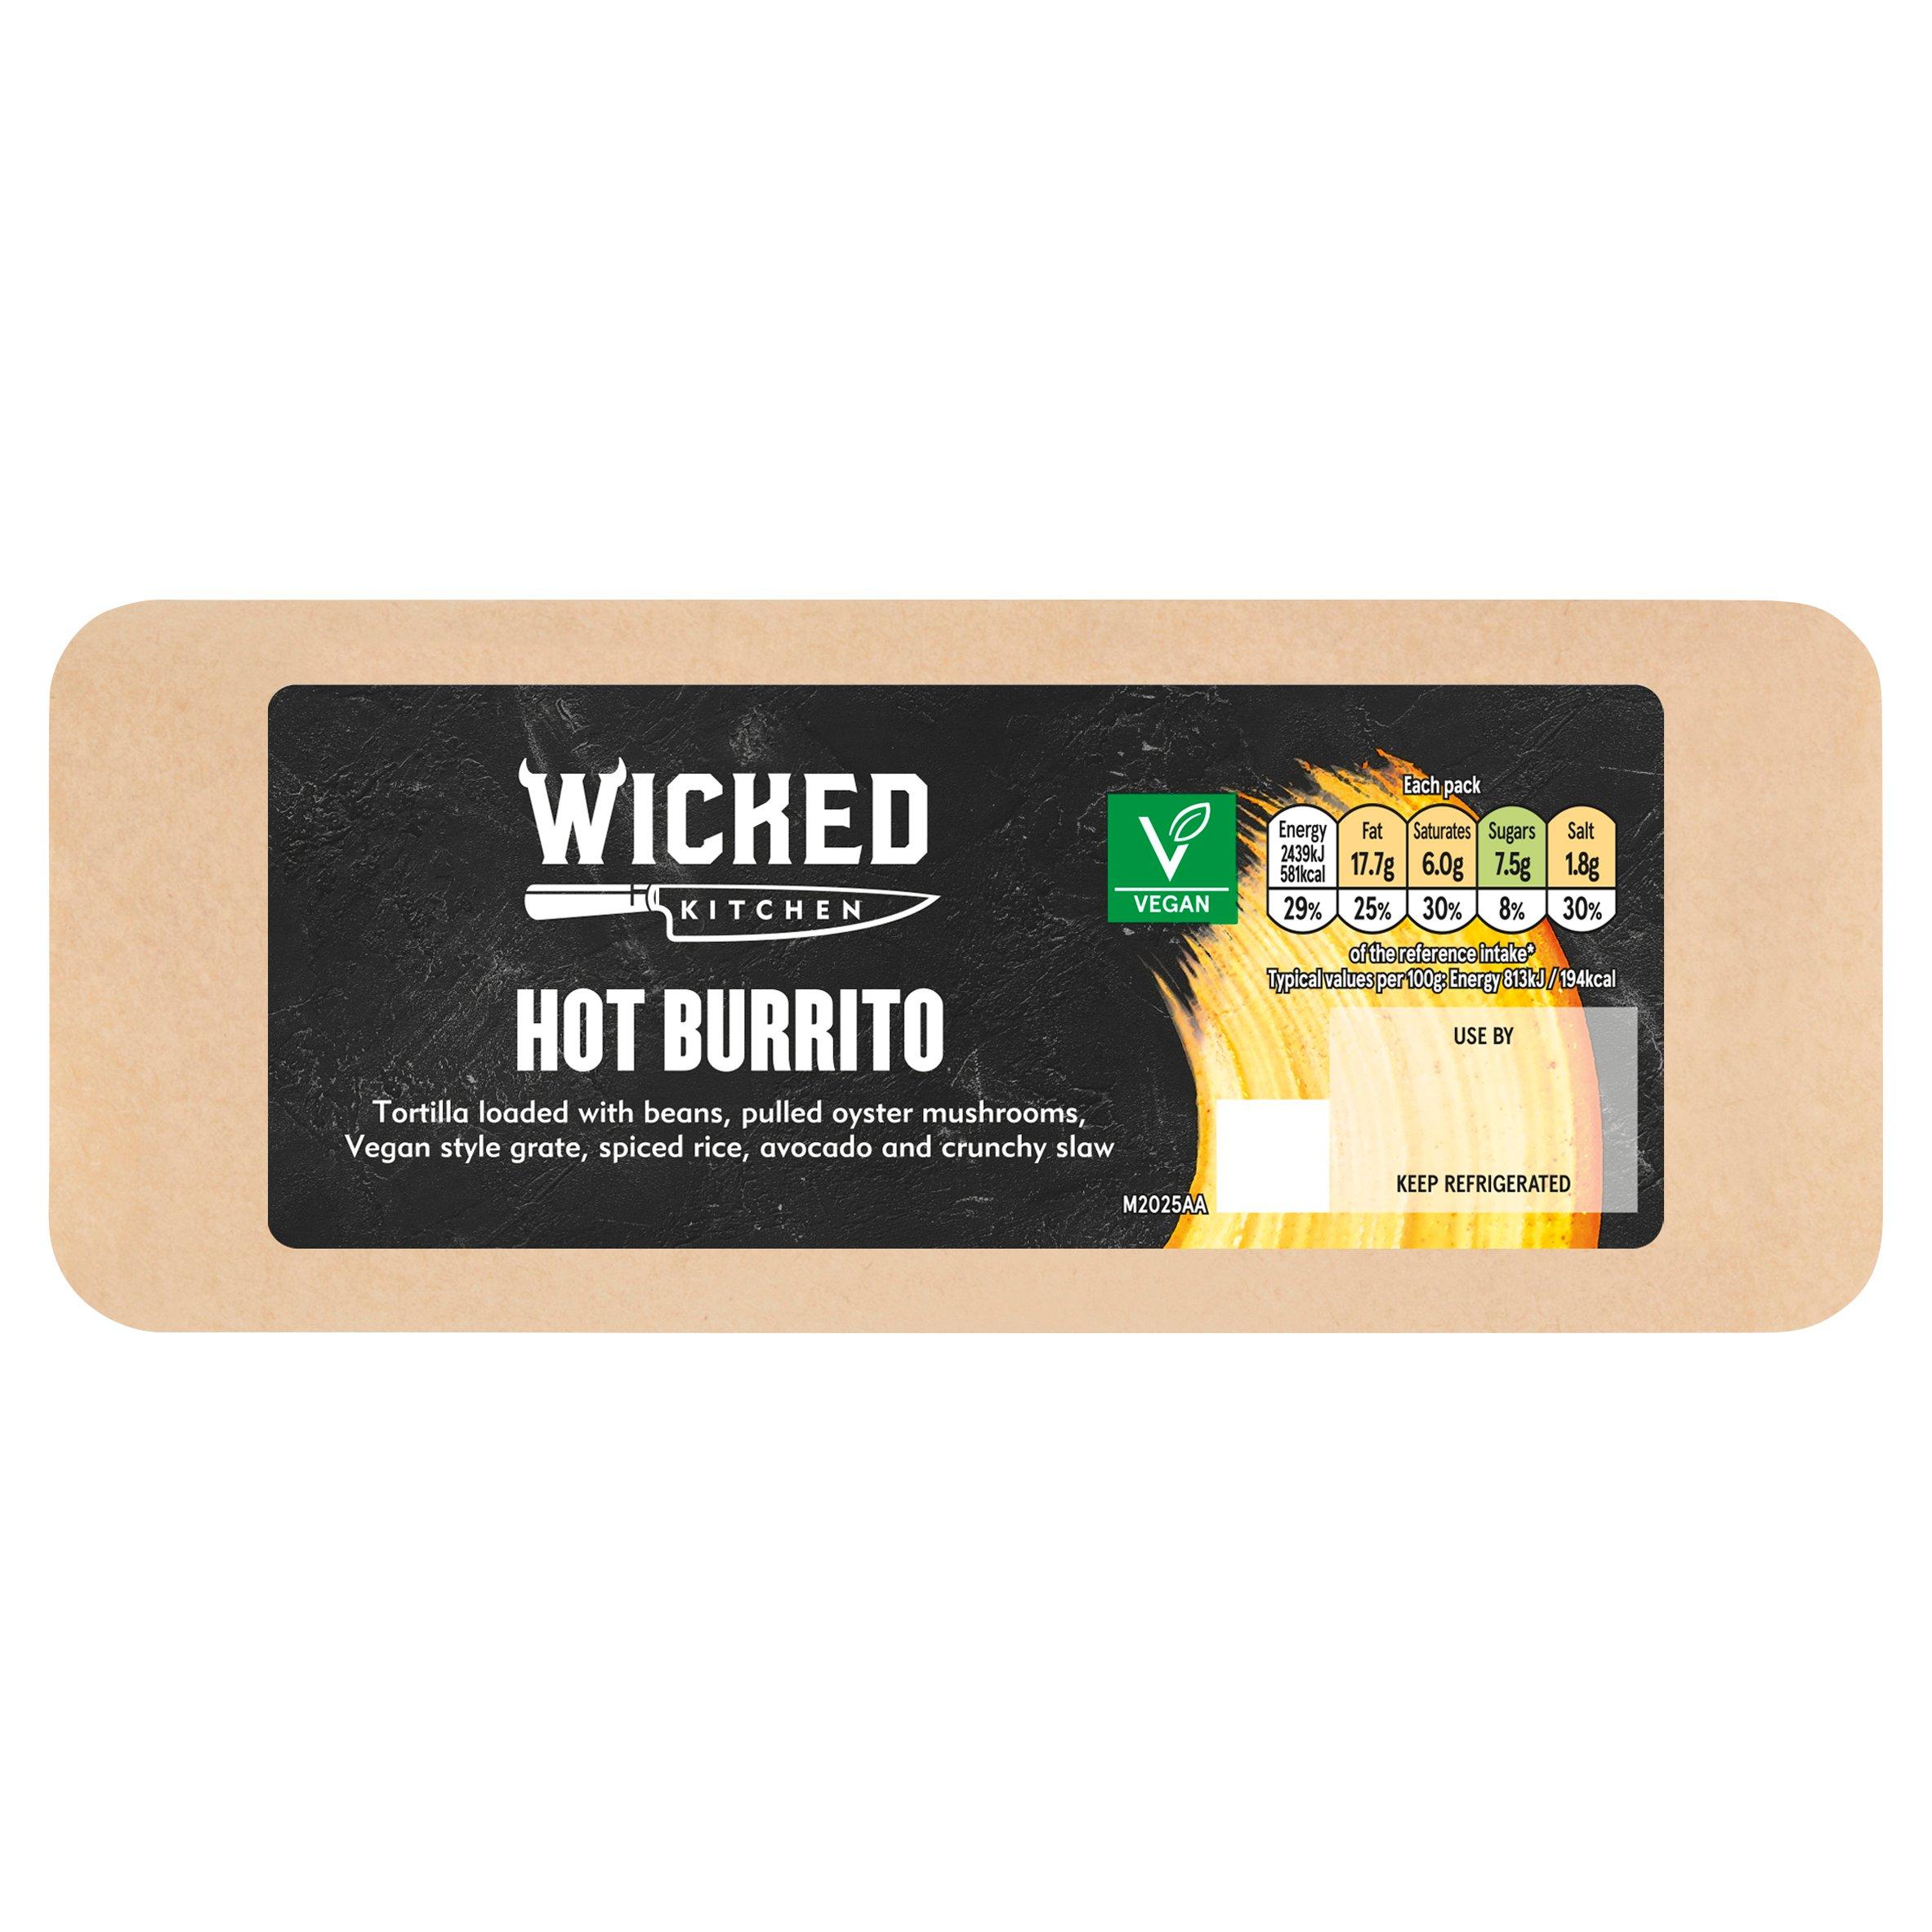 Wicked Kitchen Hot Burrito